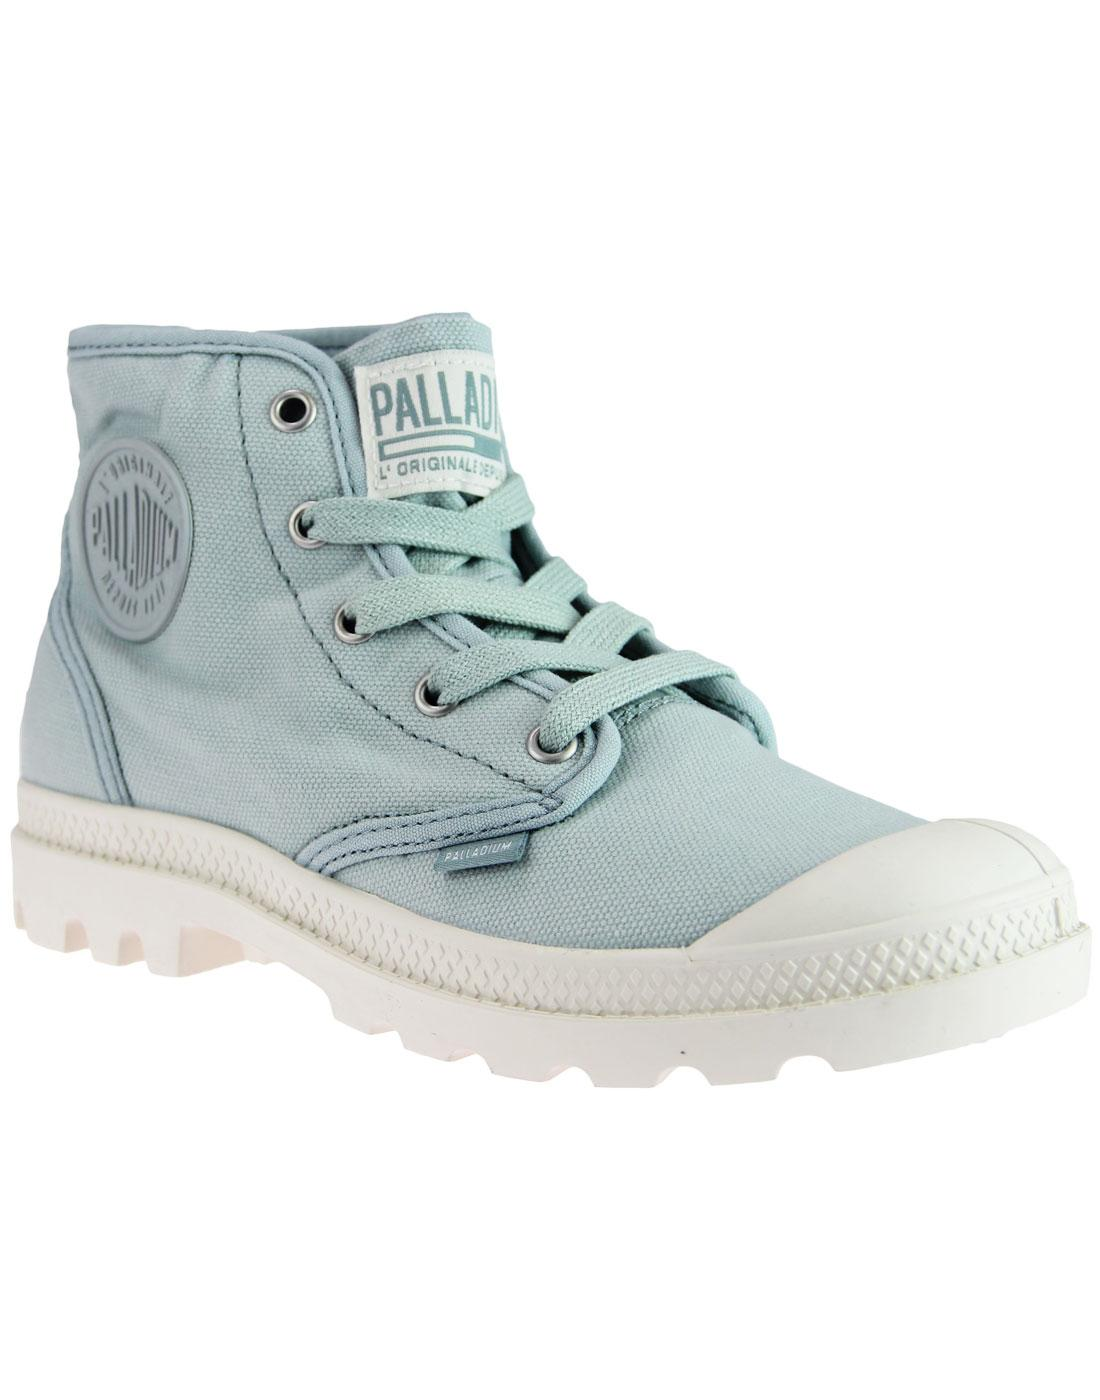 Pampa HI PALLADIUM Women's Retro Canvas Boots GM